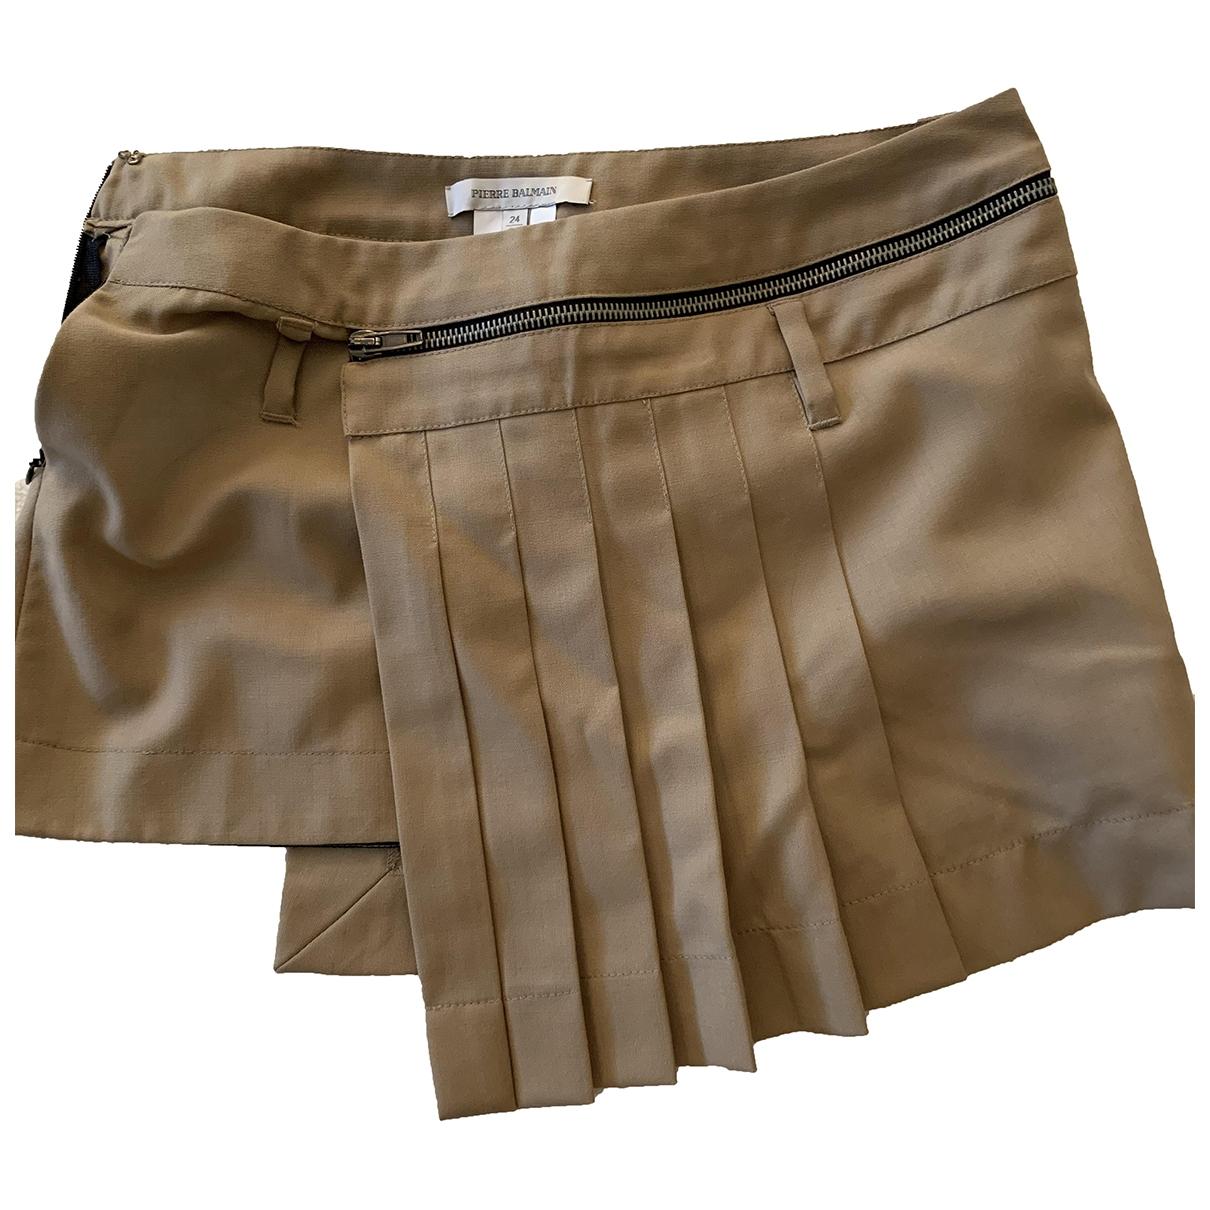 Pierre Balmain \N Beige Cotton skirt for Women 38 FR